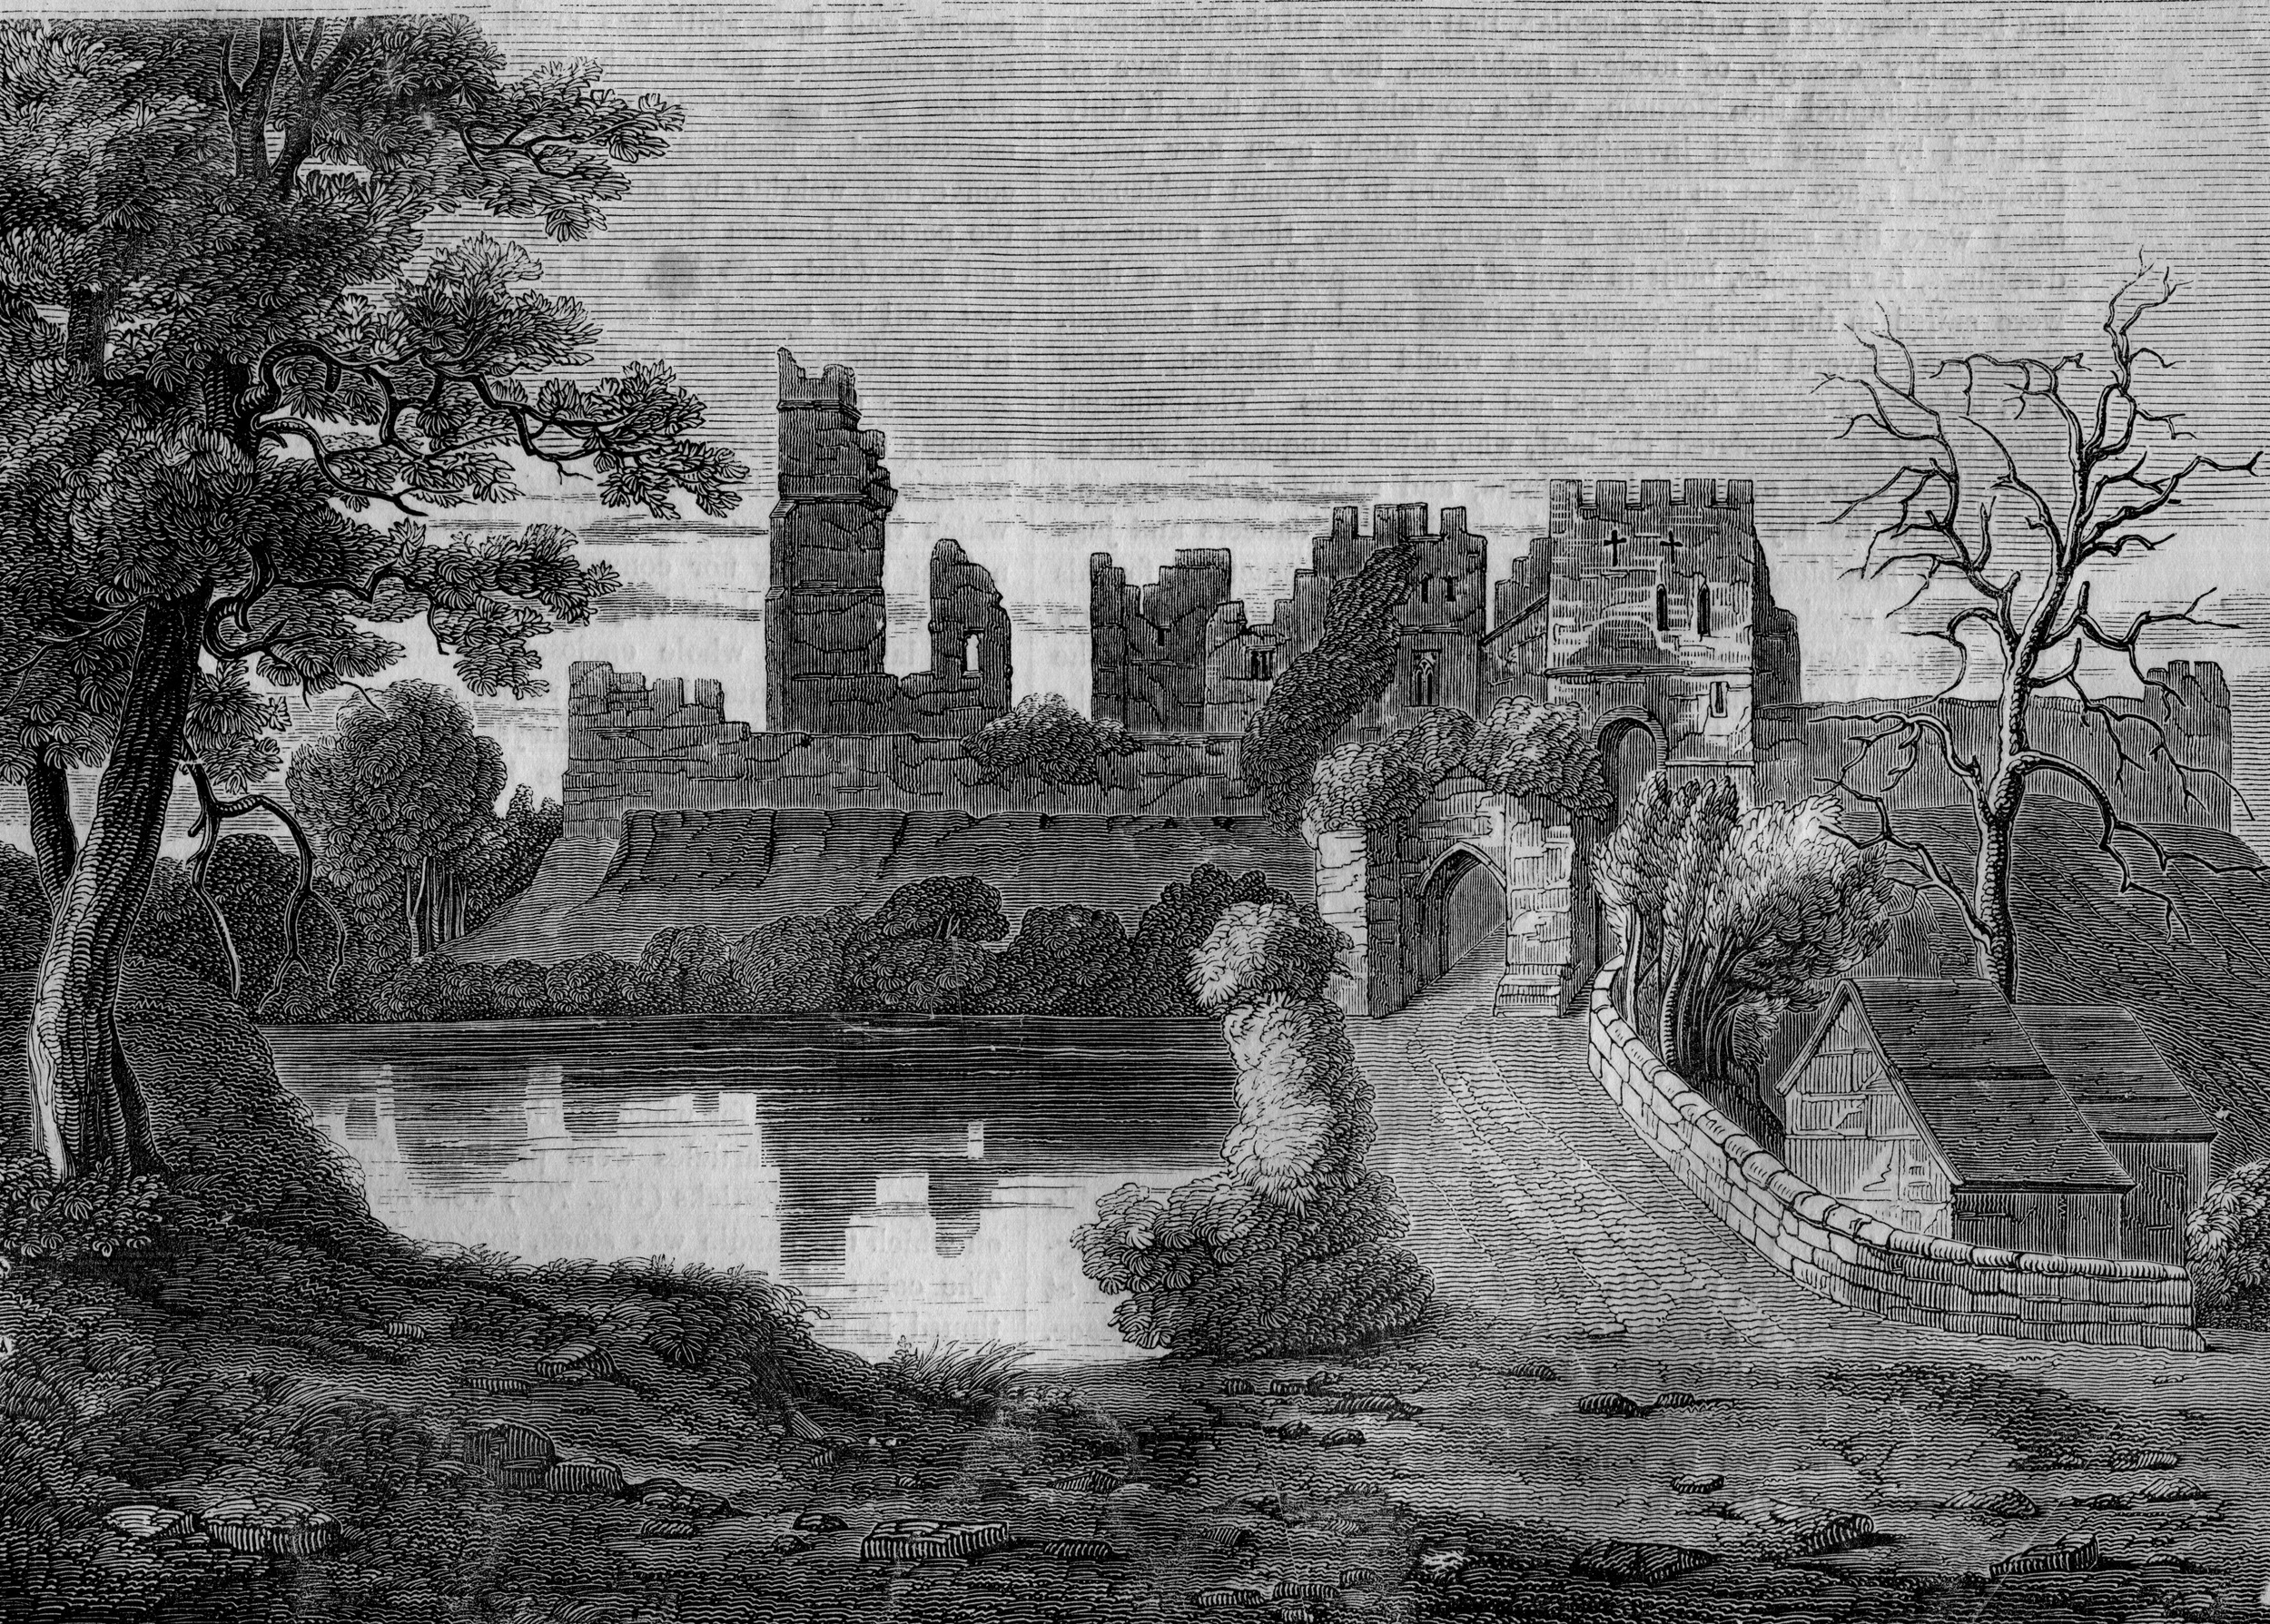 Prudhoe Castle, England